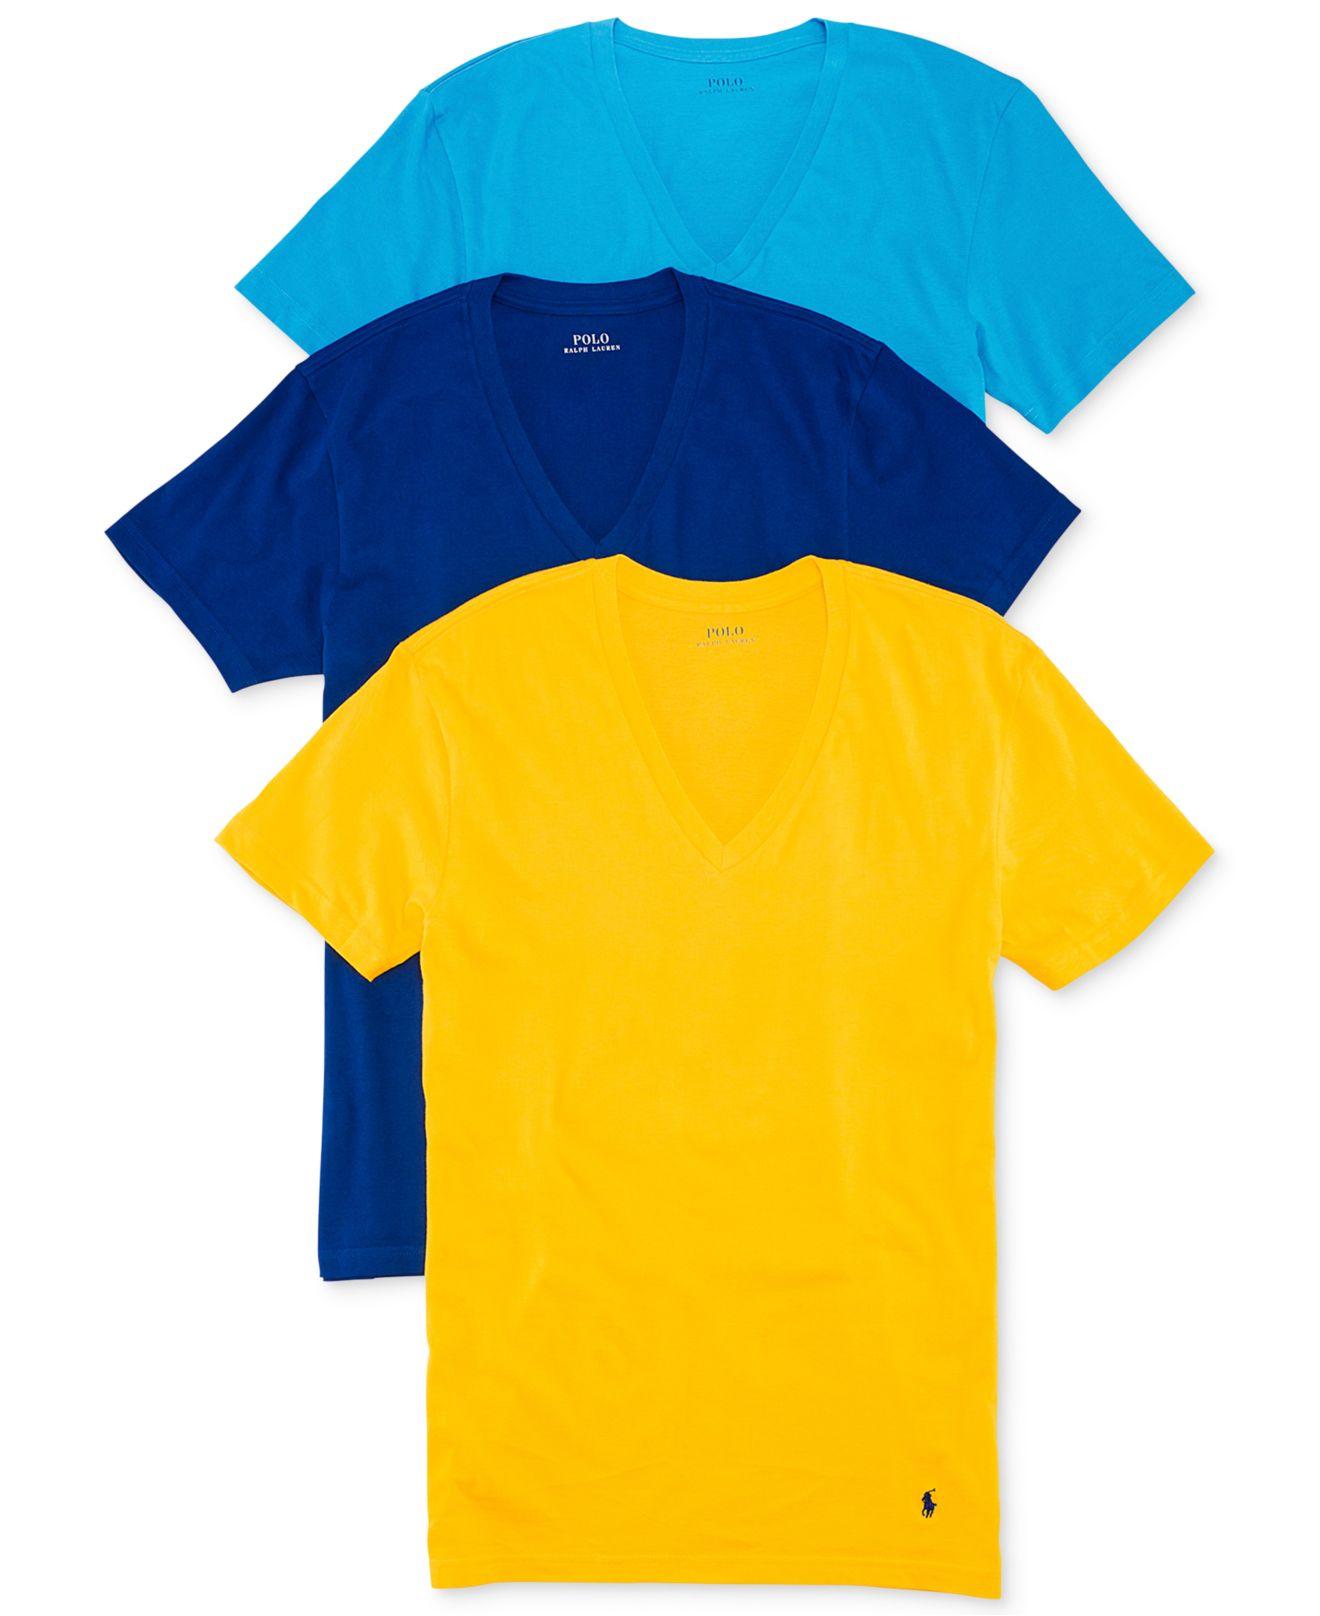 T Polo Shirt V Lauren polo White Neck Ralph 3 Pack qSzMVUp